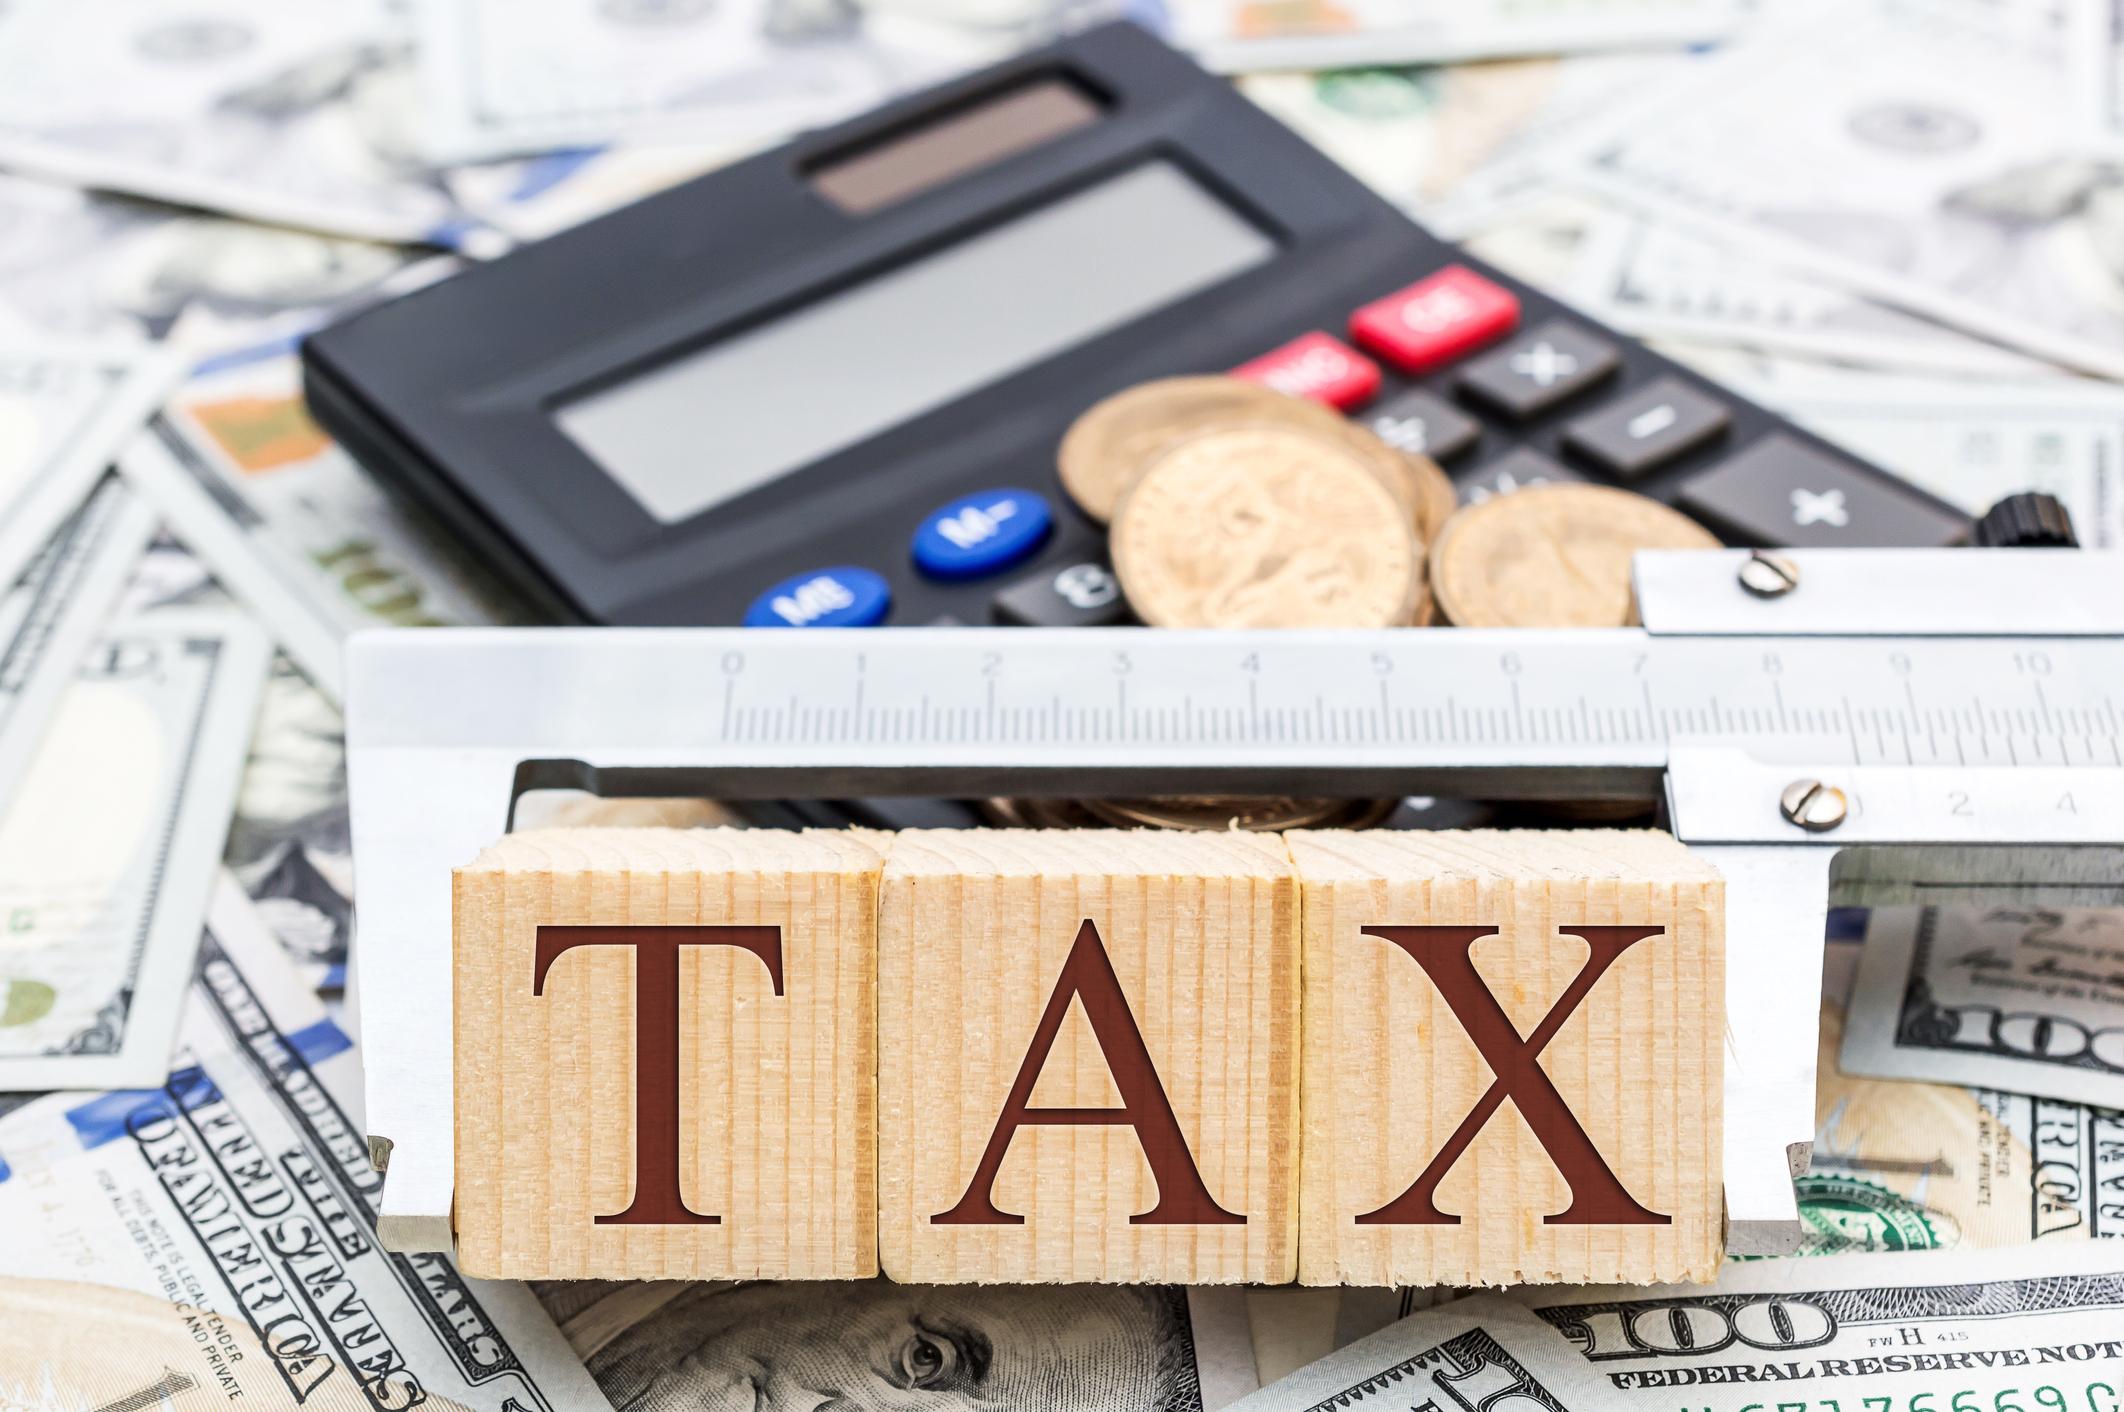 2019.7.estimated.tax.jpg